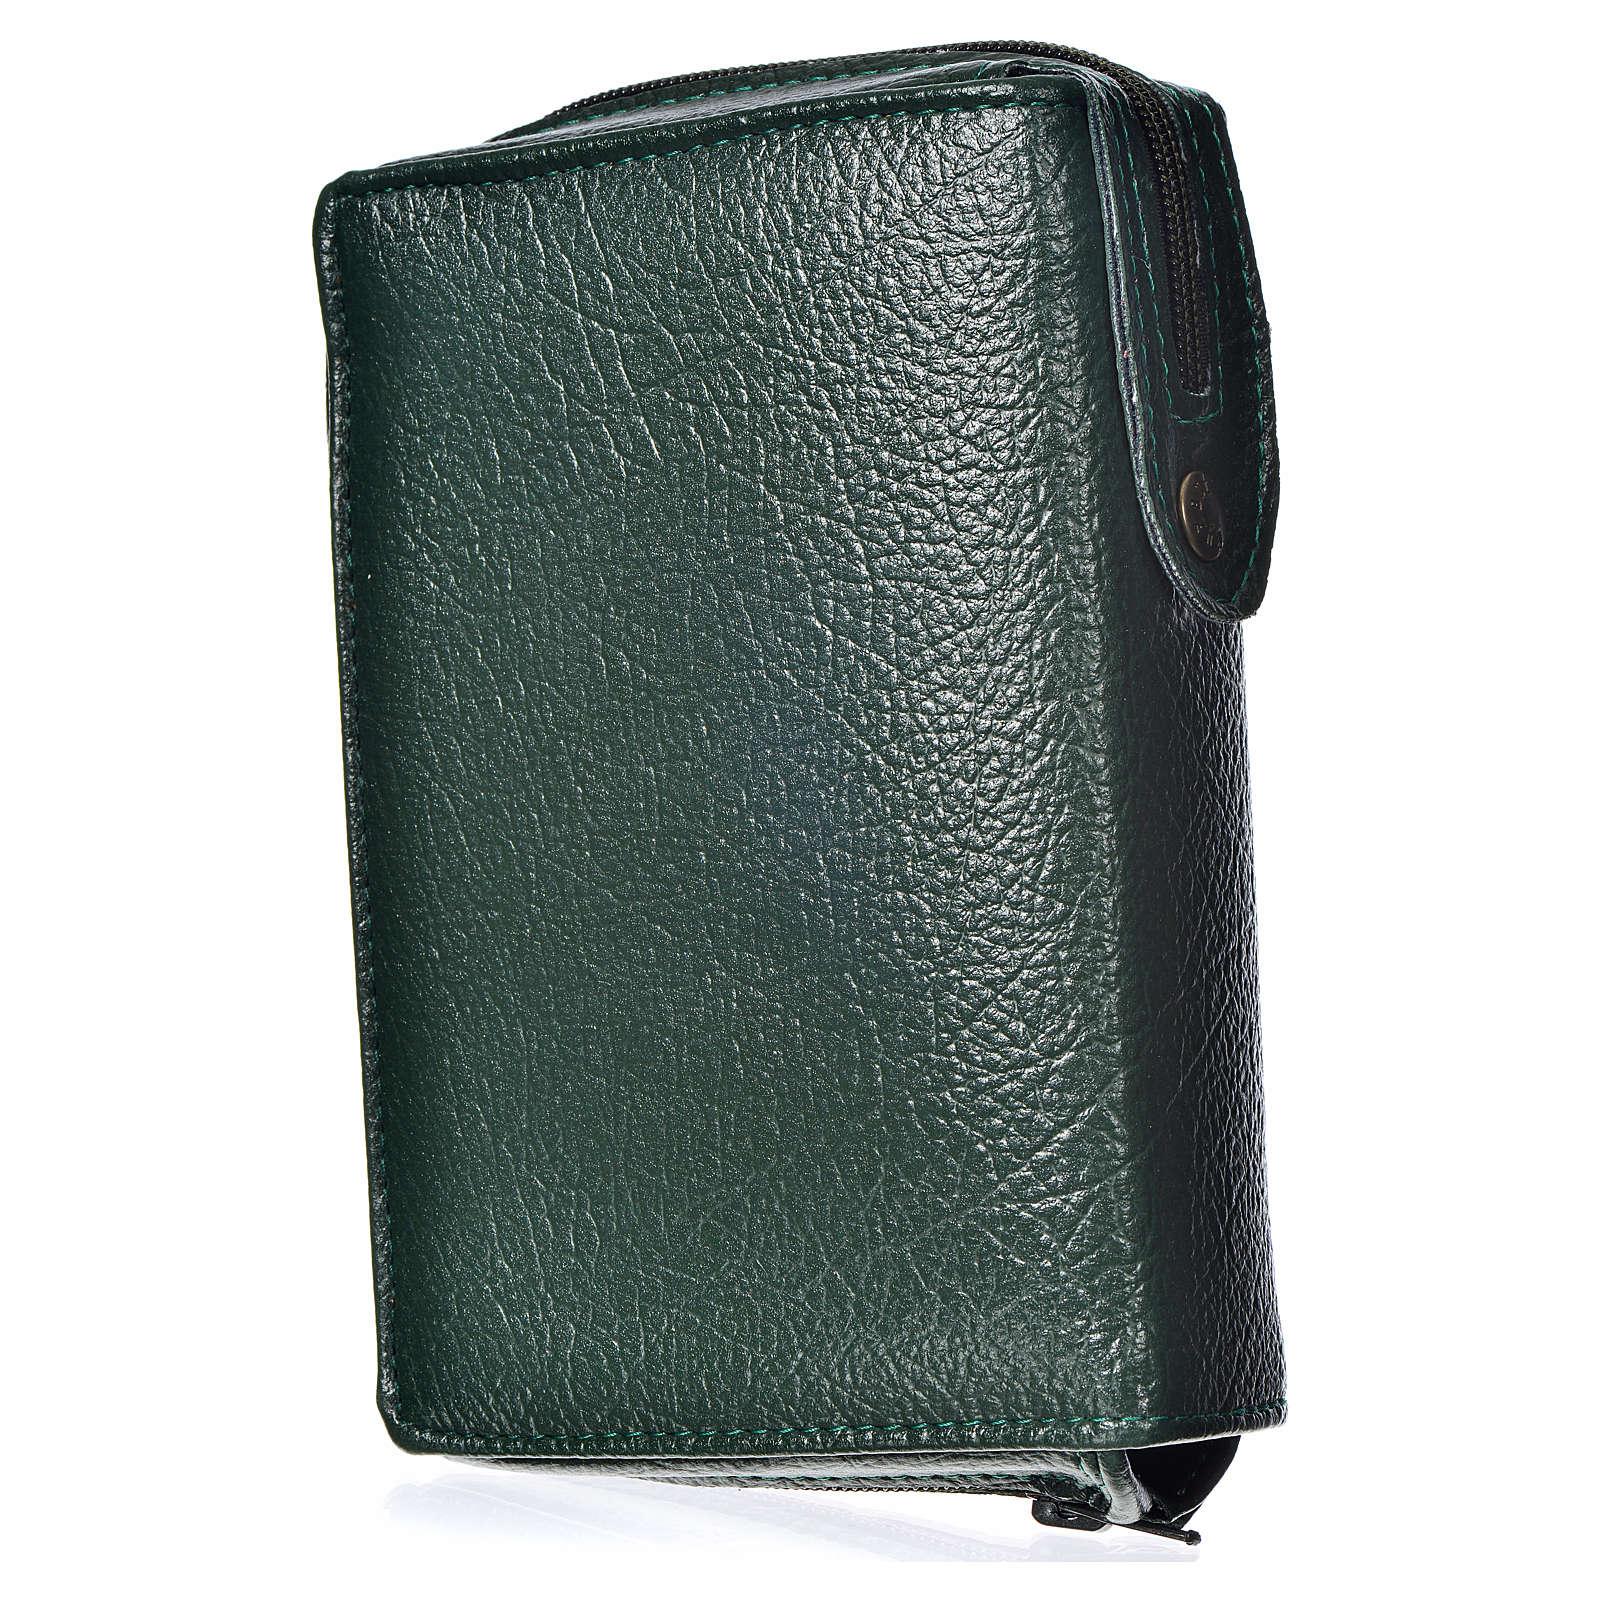 Funda Sagrada Biblia CEE Ed. popular verde Divina Misericordia 4